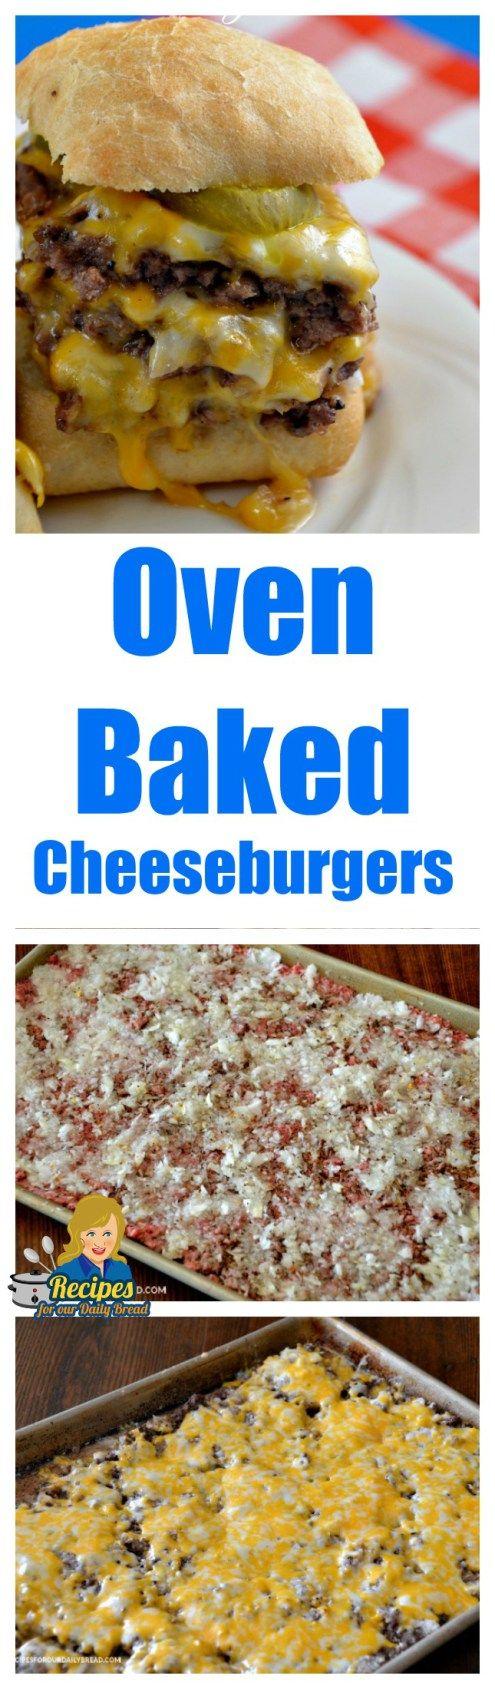 Simple Chicken Casserole Recipes Ovens